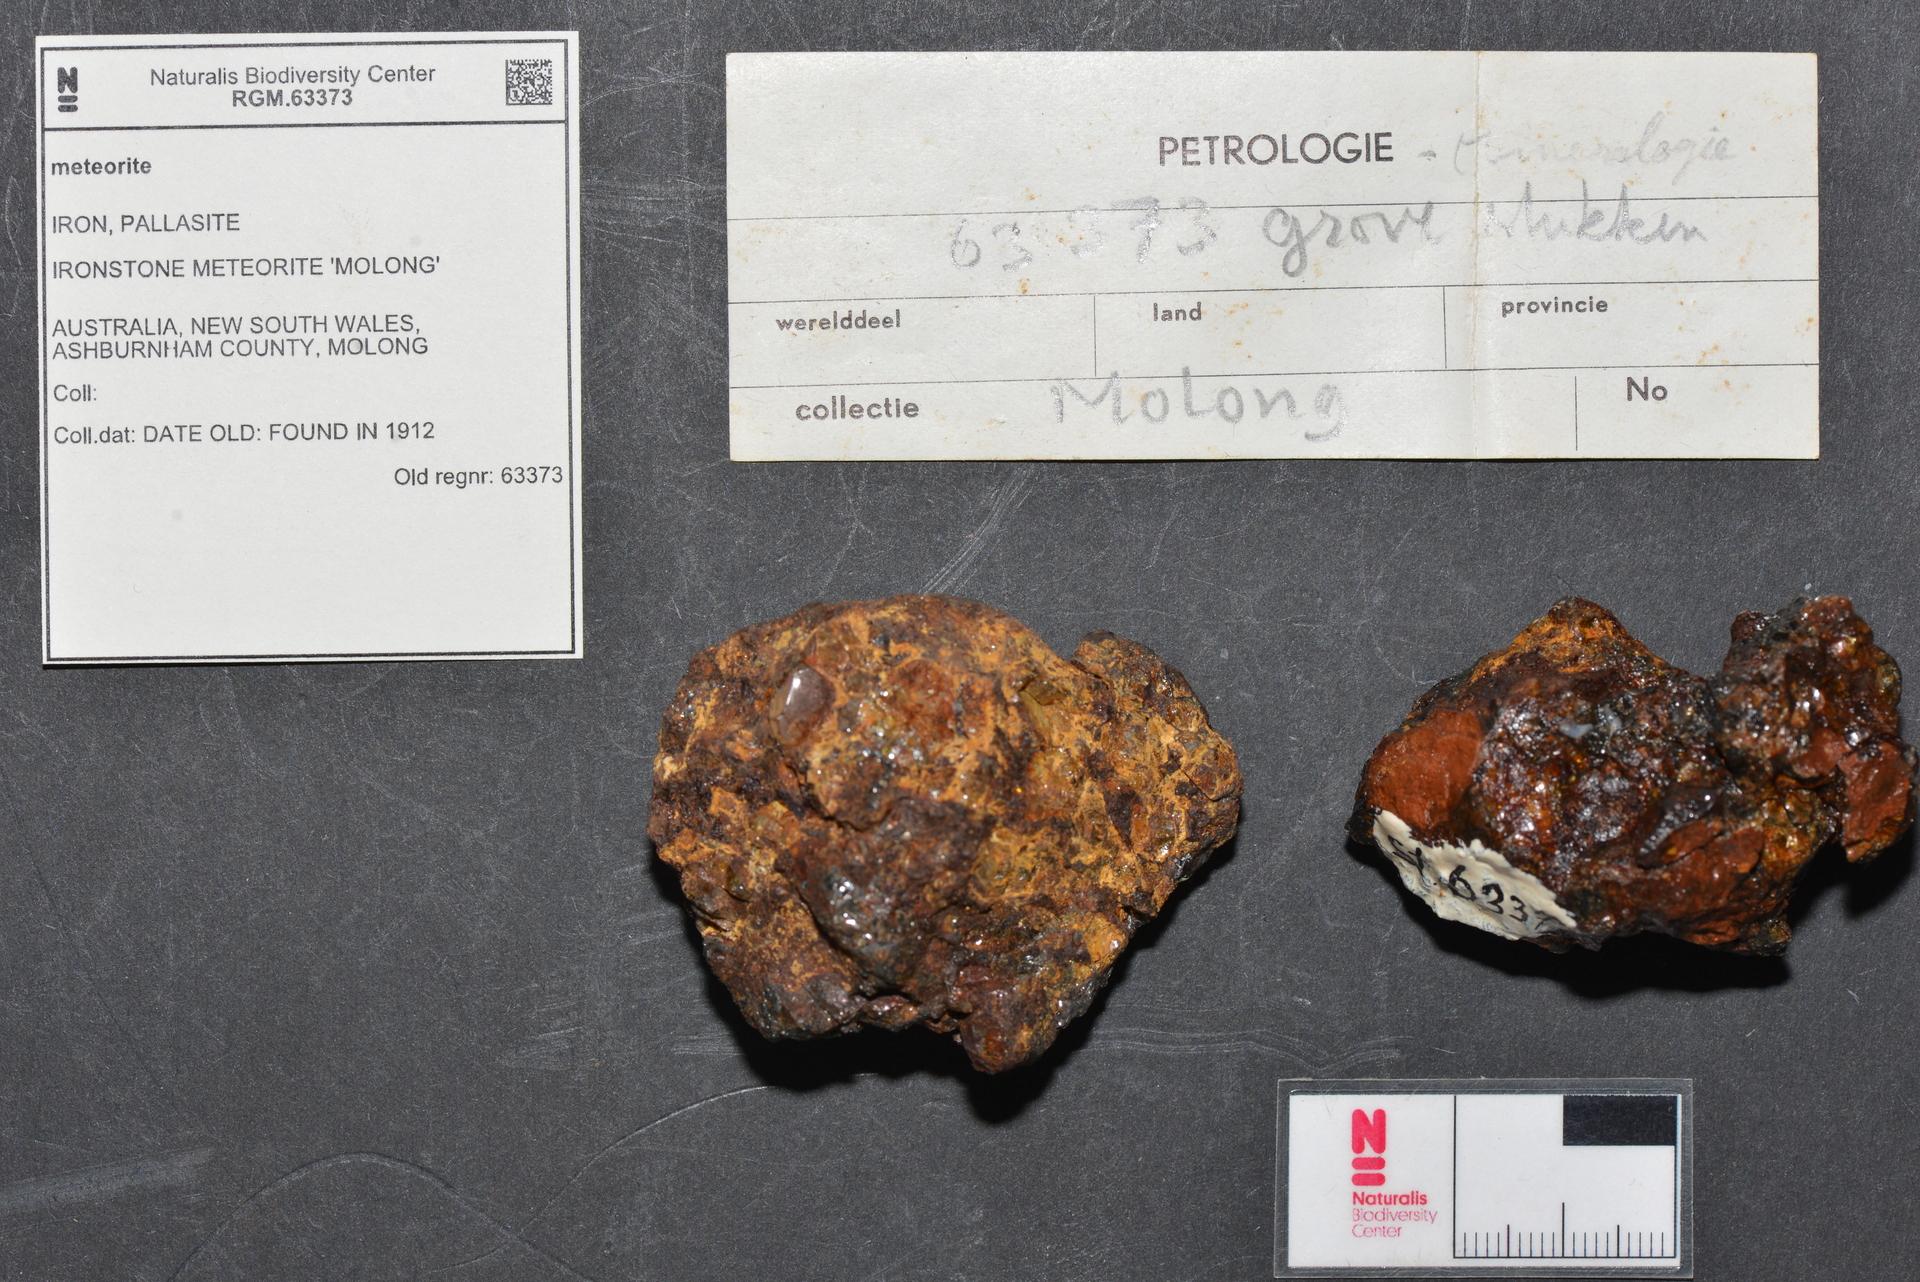 RGM.63373 | Pallasite, PMG